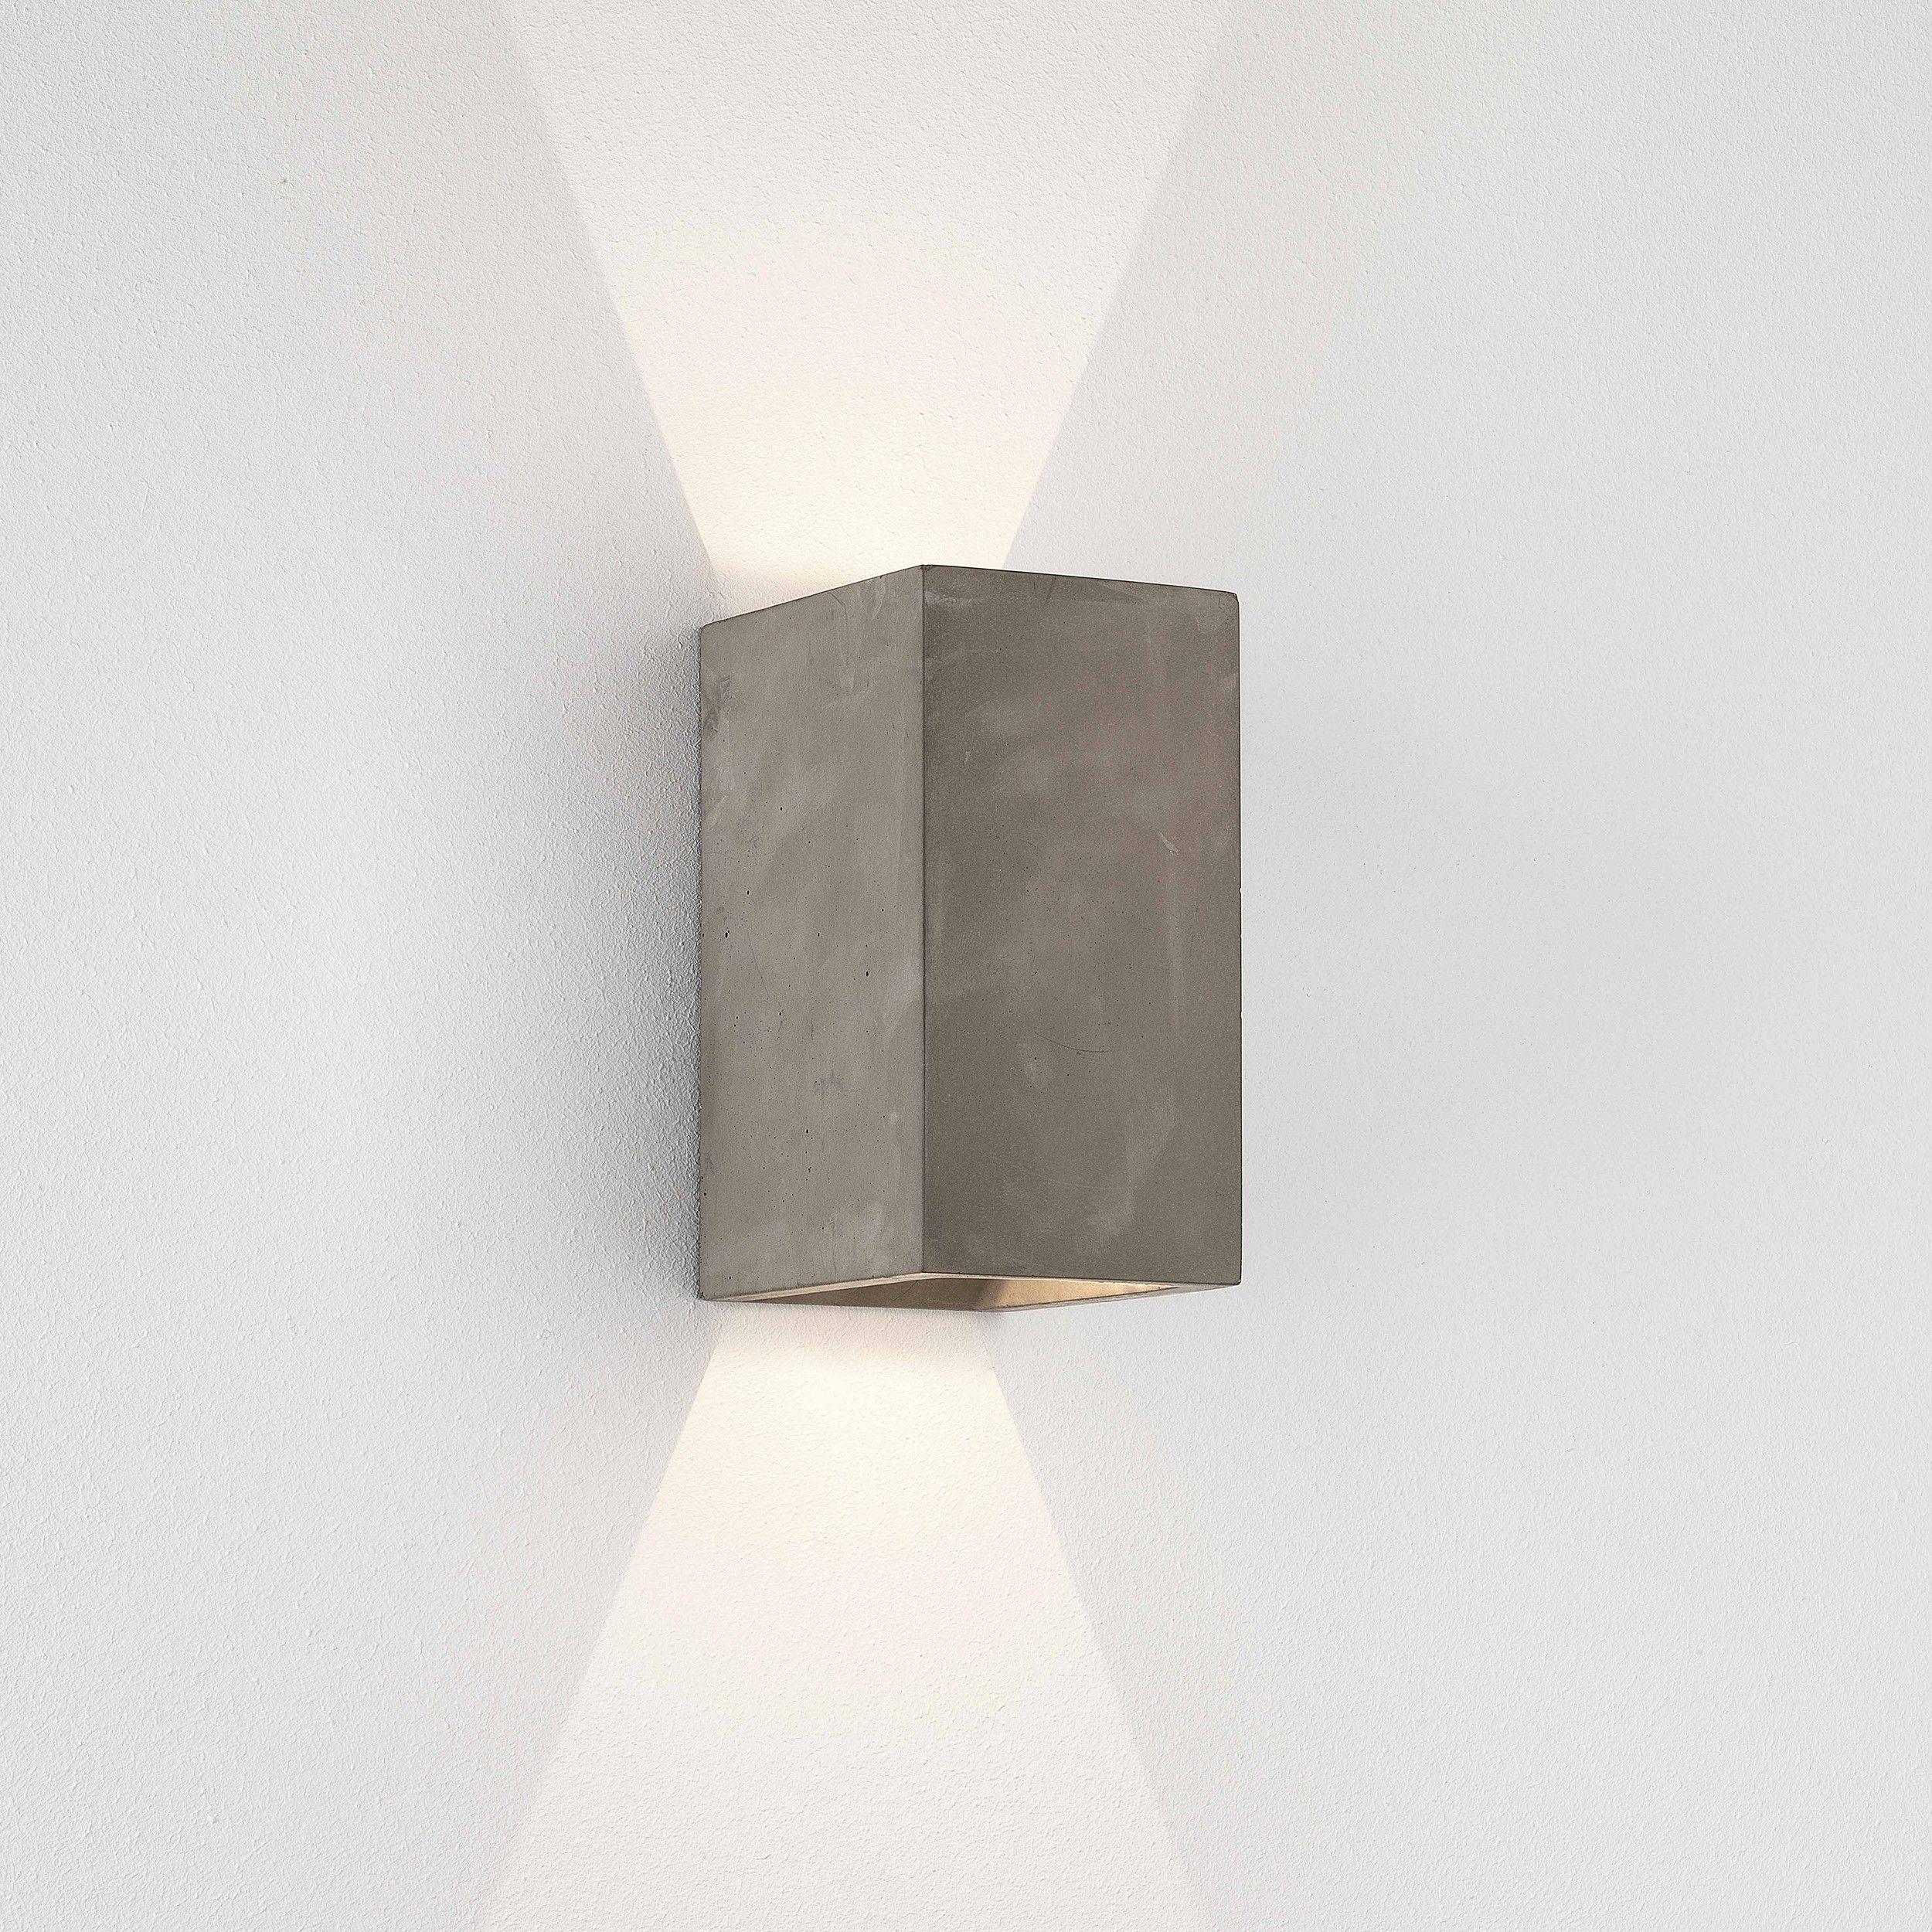 Product Exterior Wall Light Wall Lights Wall Wash Lighting